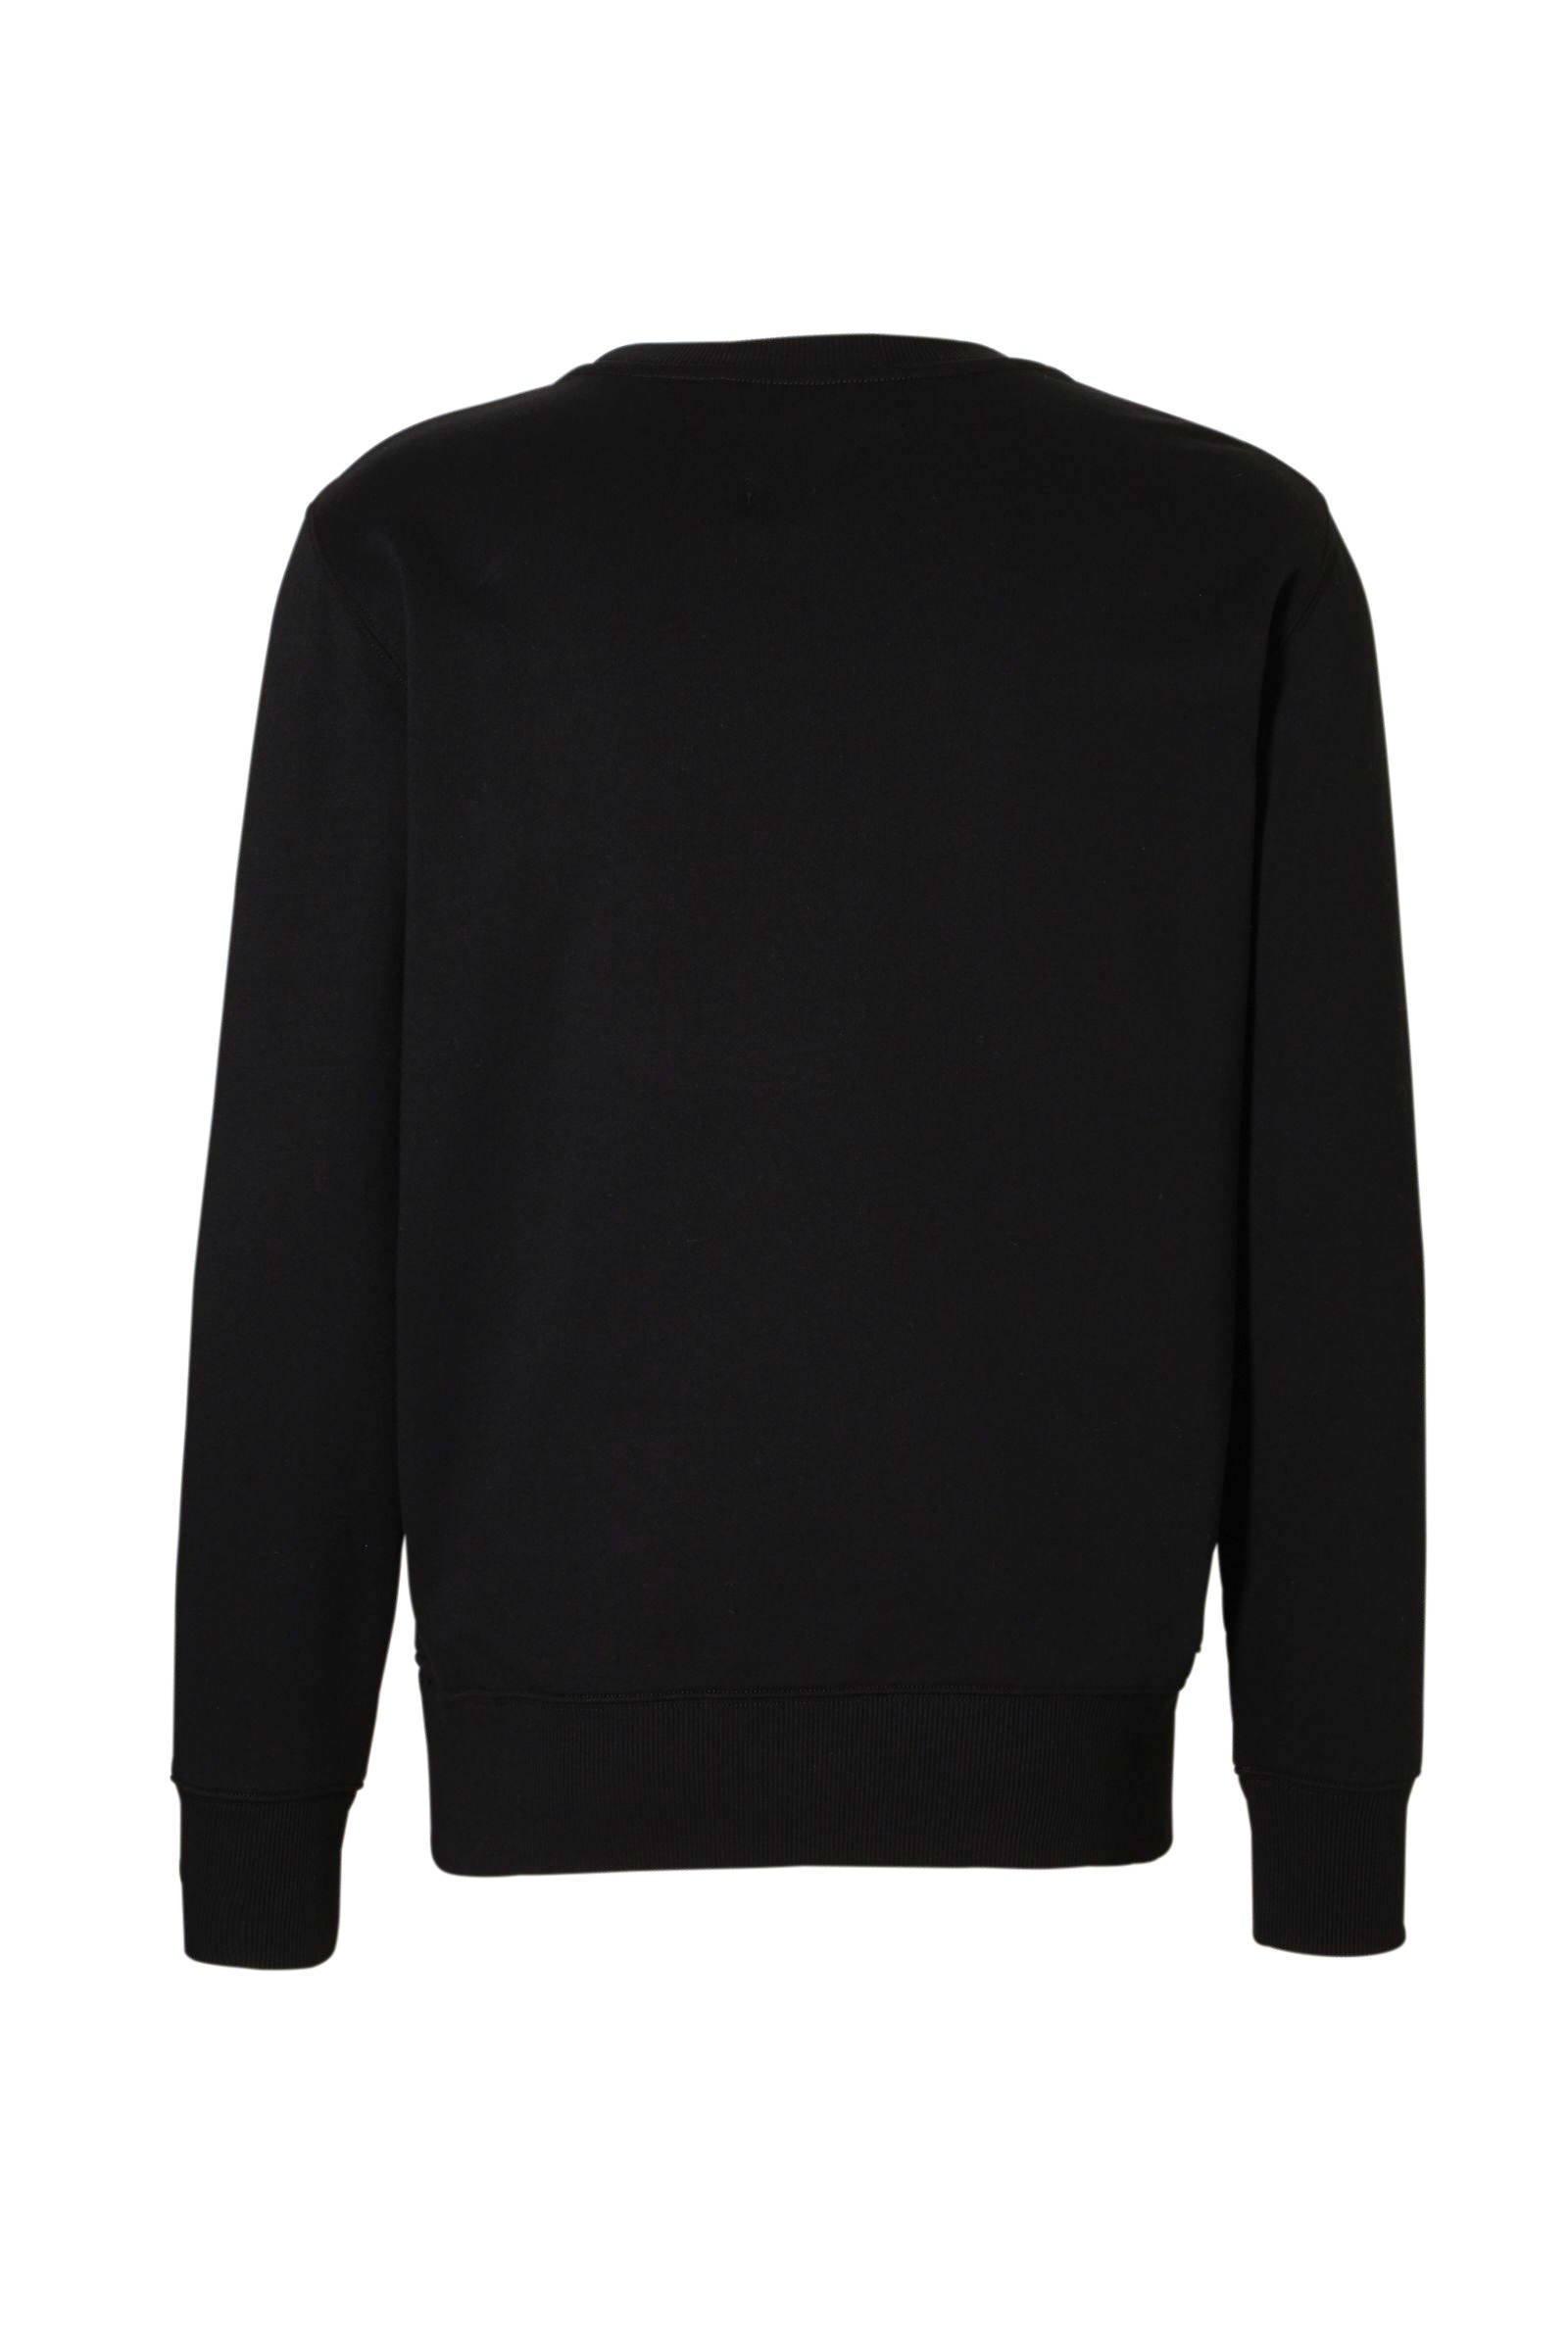 Star Ocelat RAW sweater G Star G RAW vqOw16